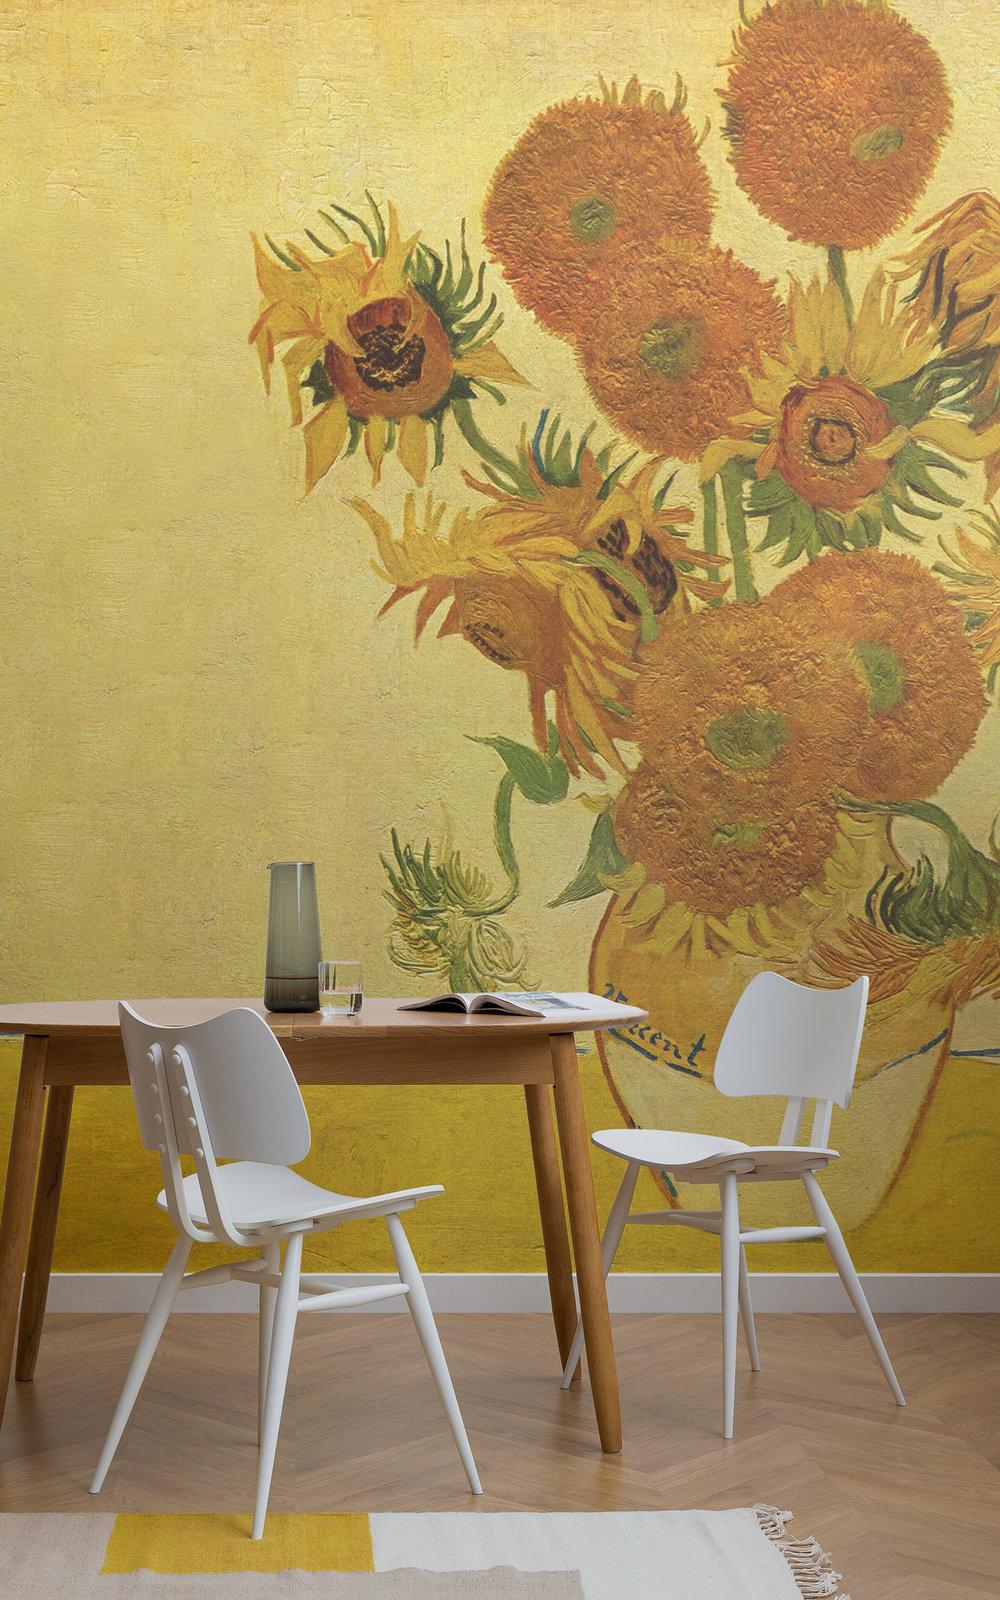 Sunflowers-Lifestyle-Web.jpg